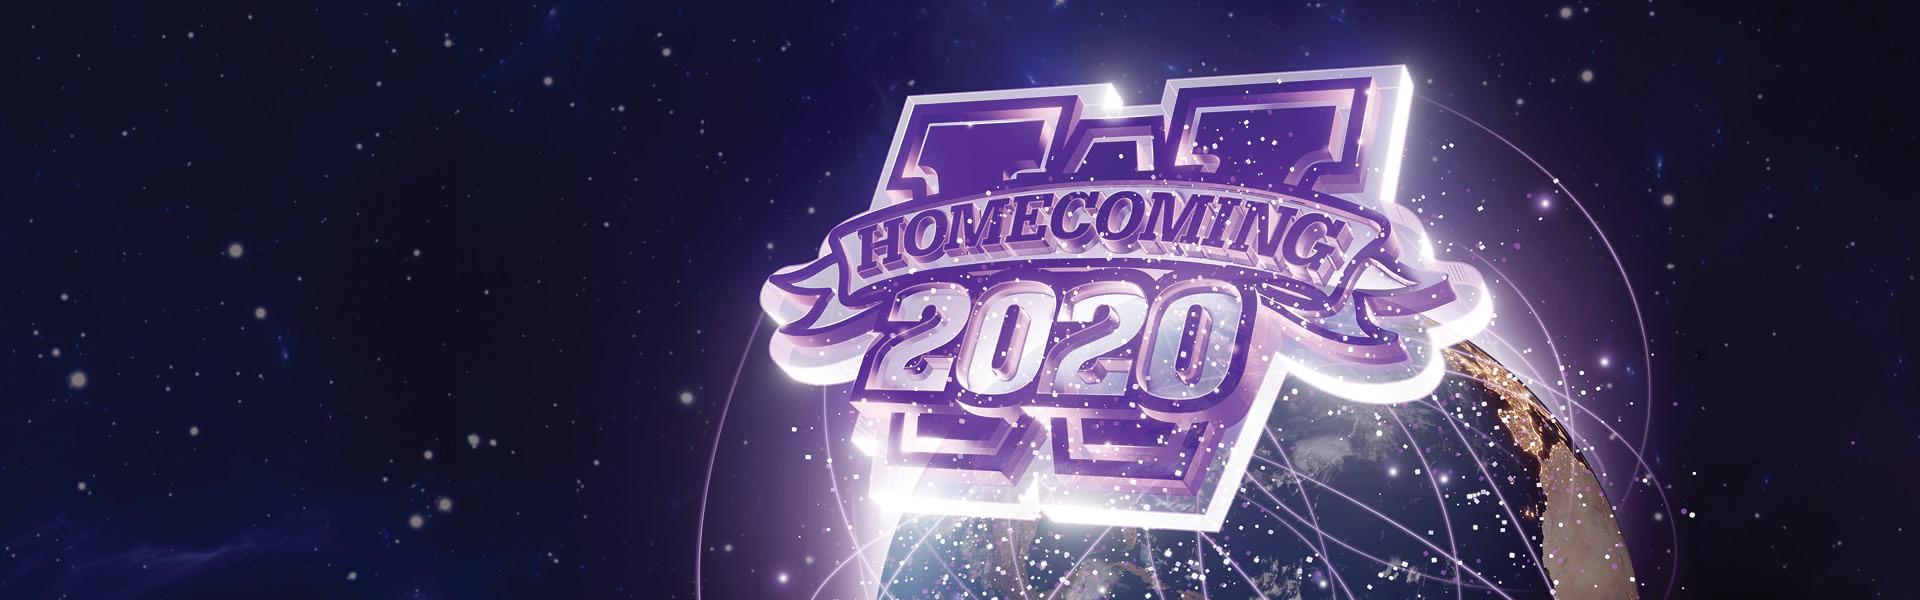 Homecoming Banner 2020